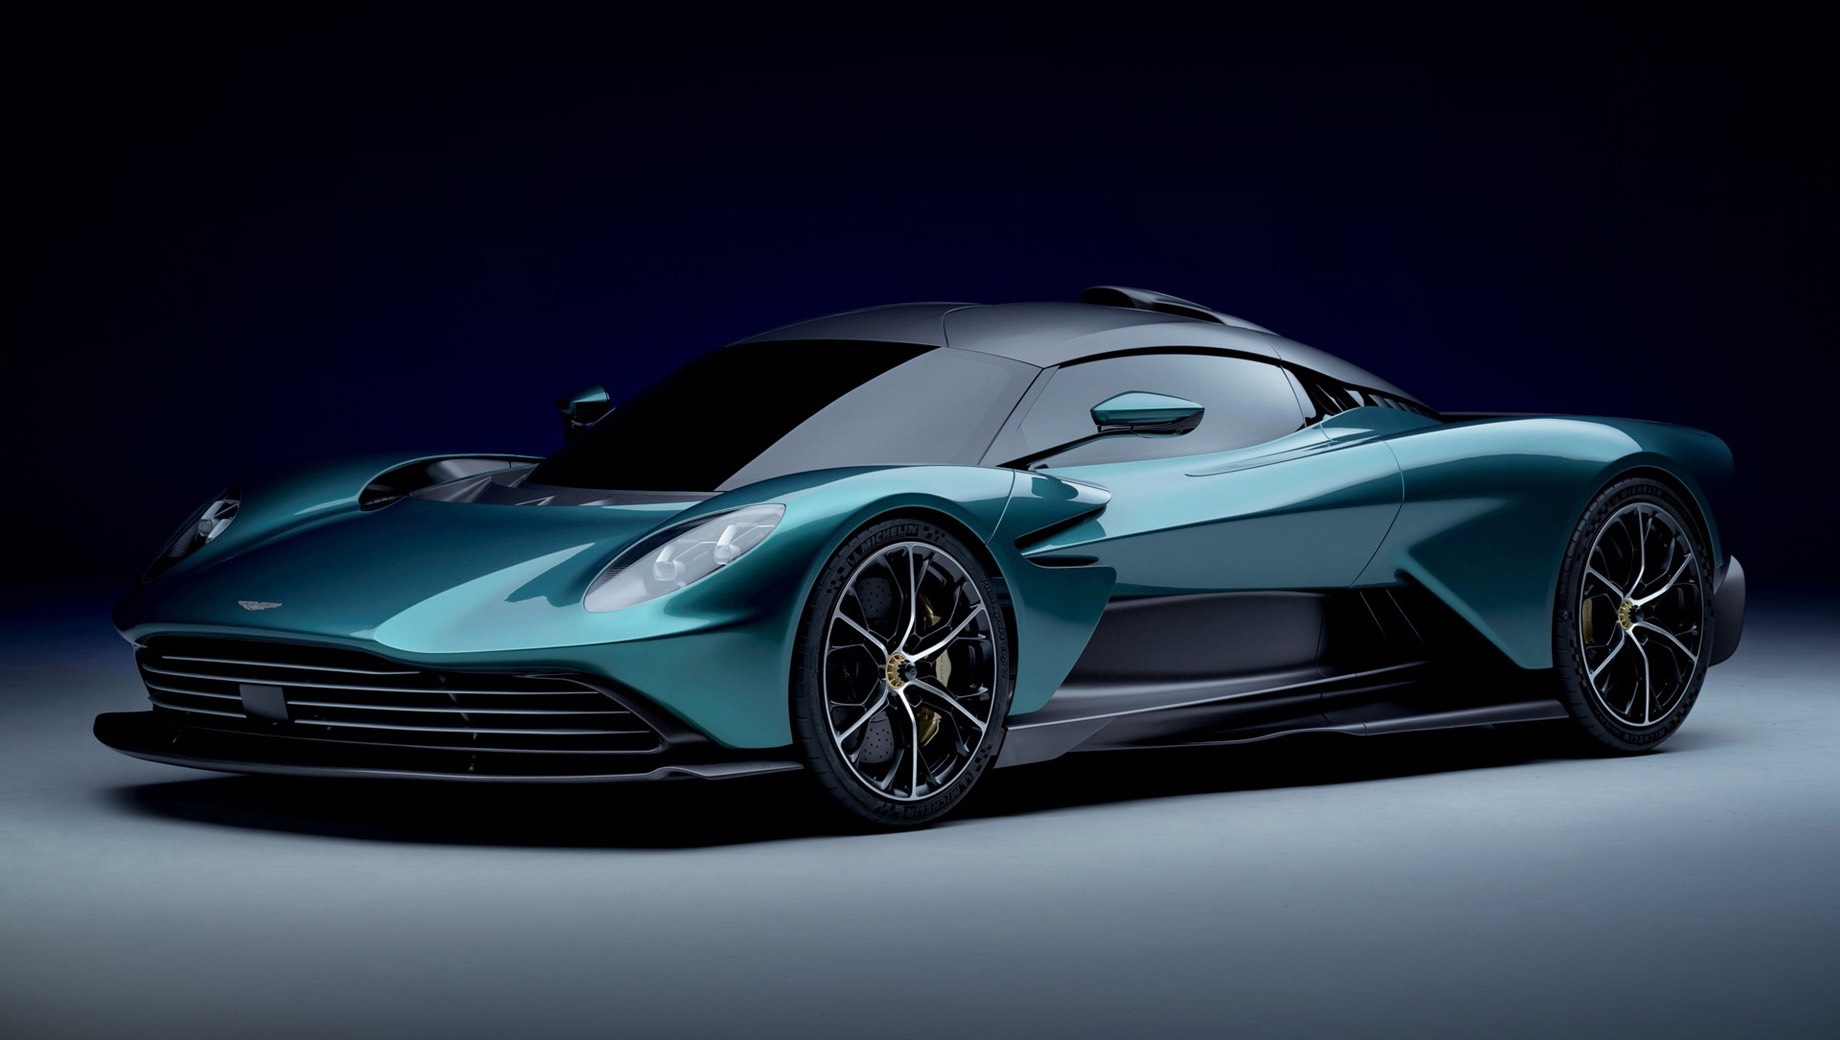 Гиперкар Aston Martin Valhalla предстал в серийном обличье